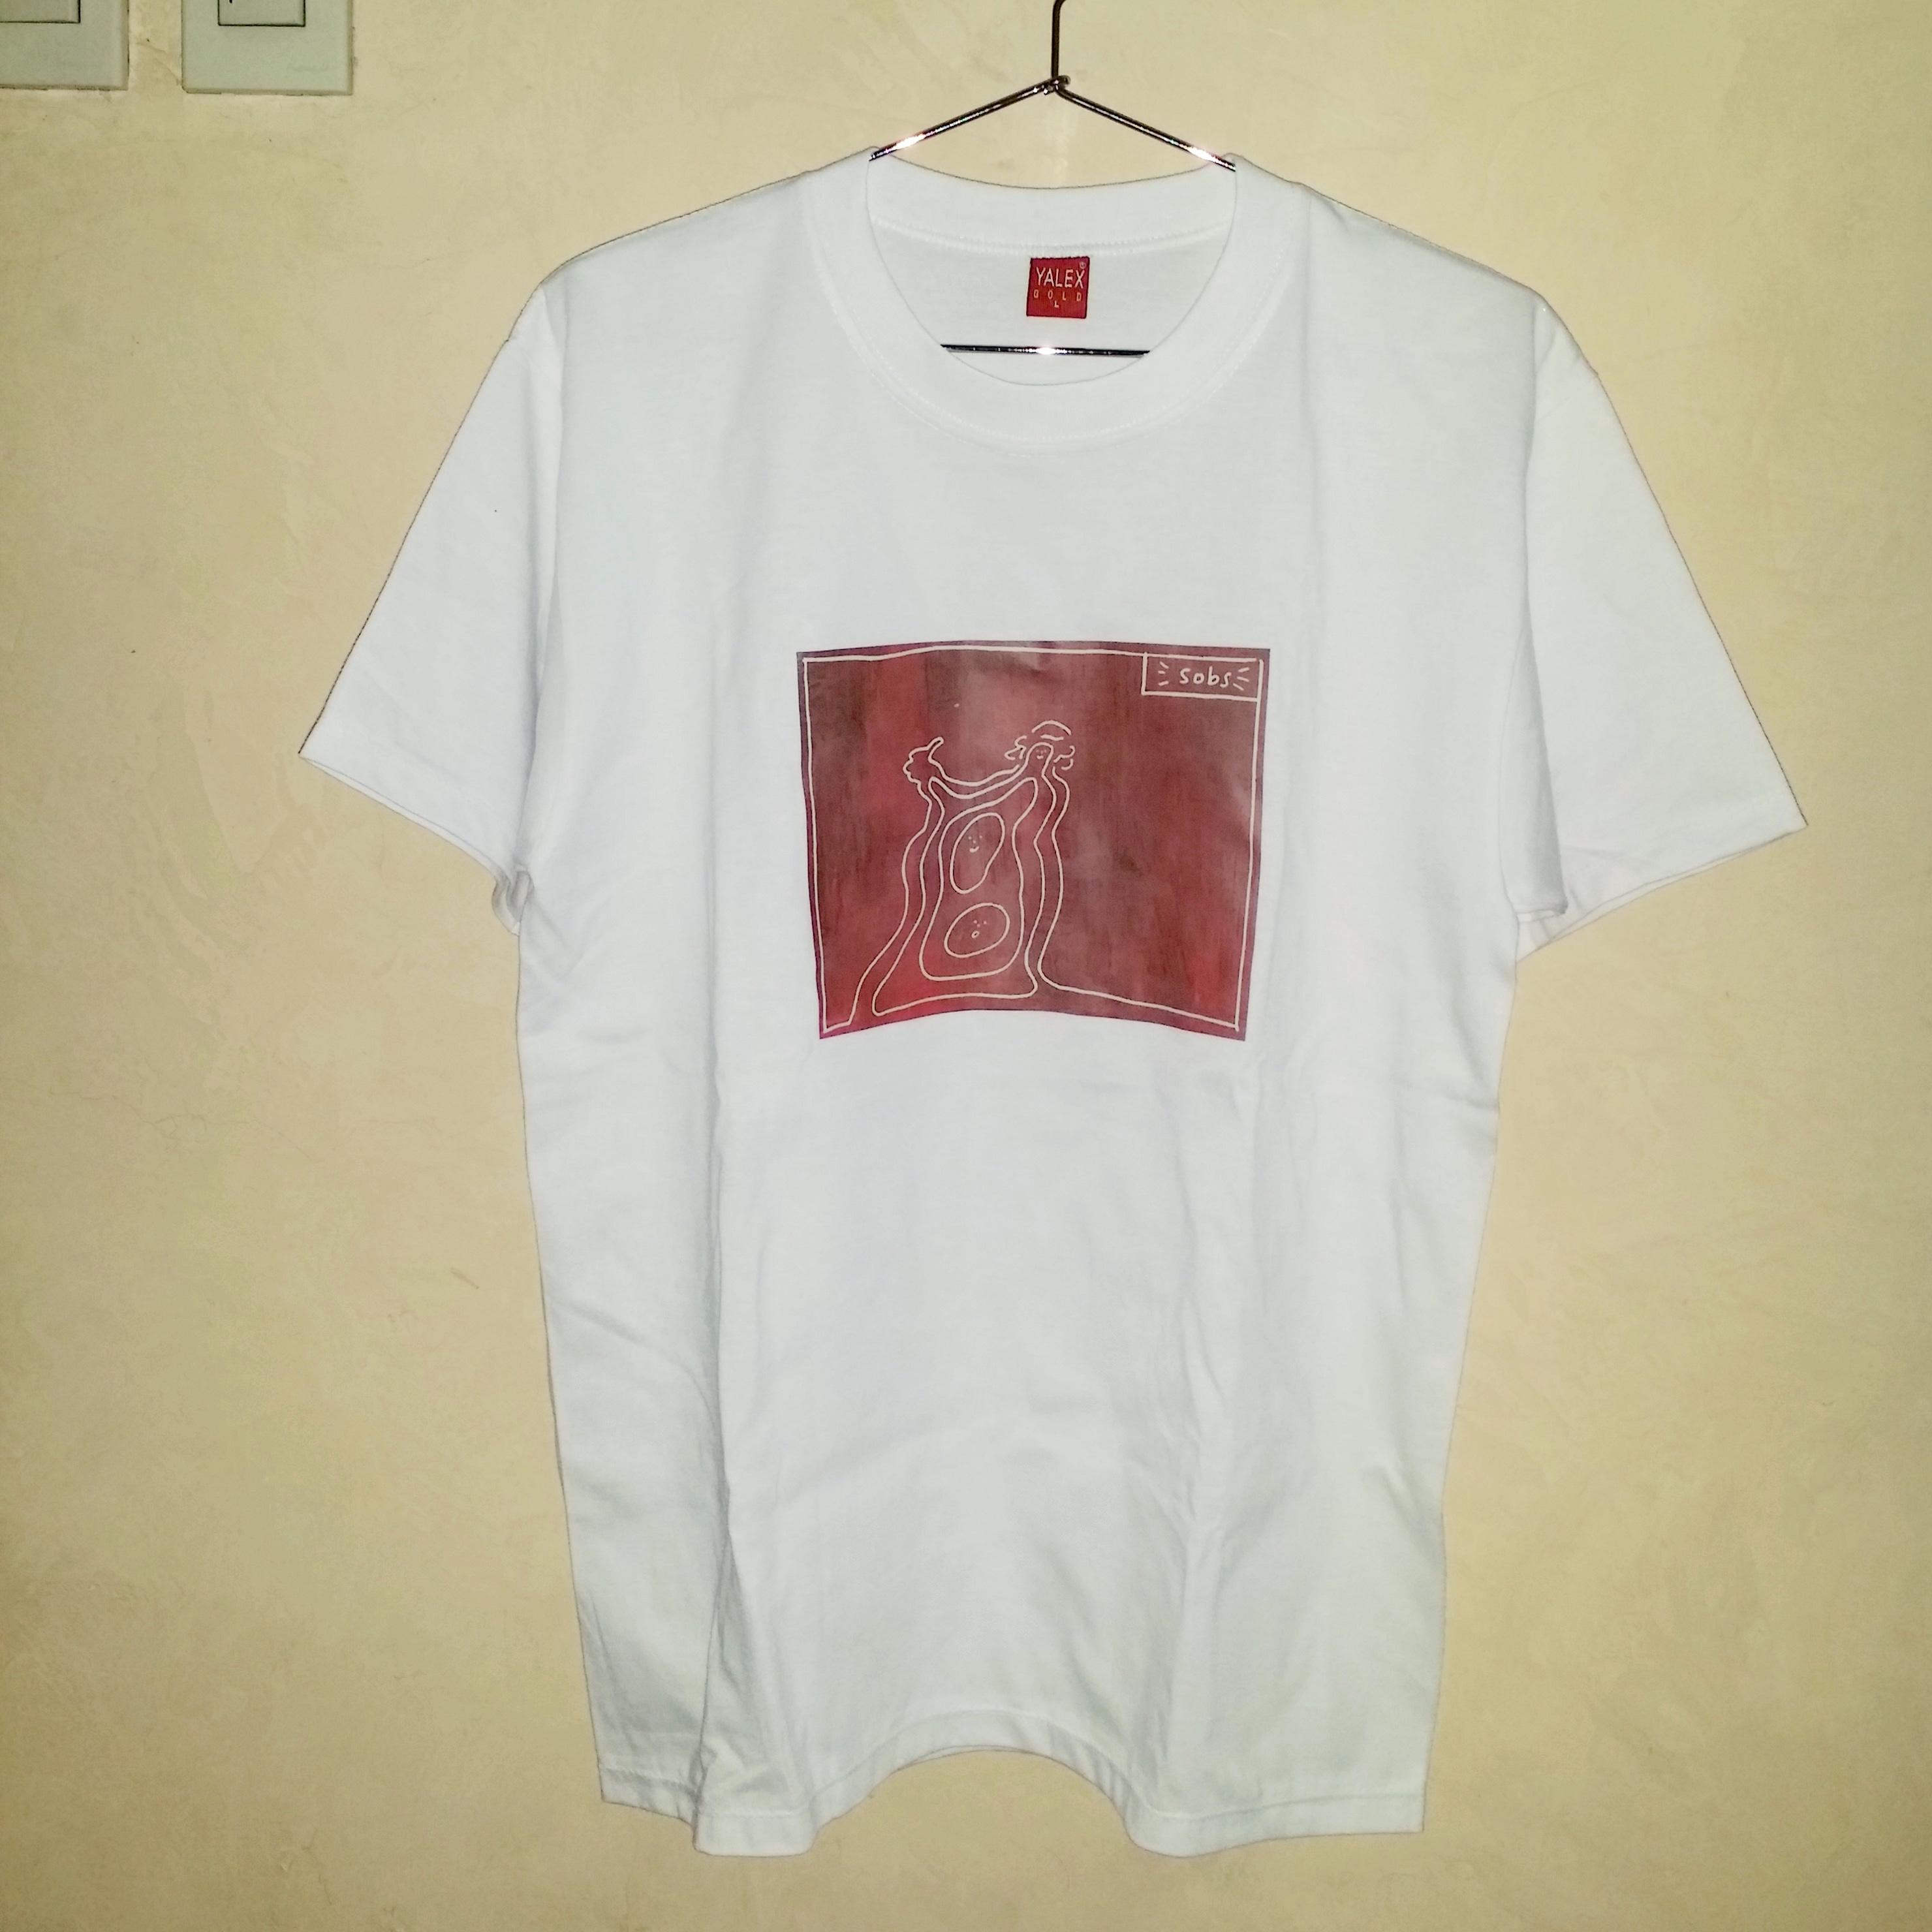 Sobs T-Shirt